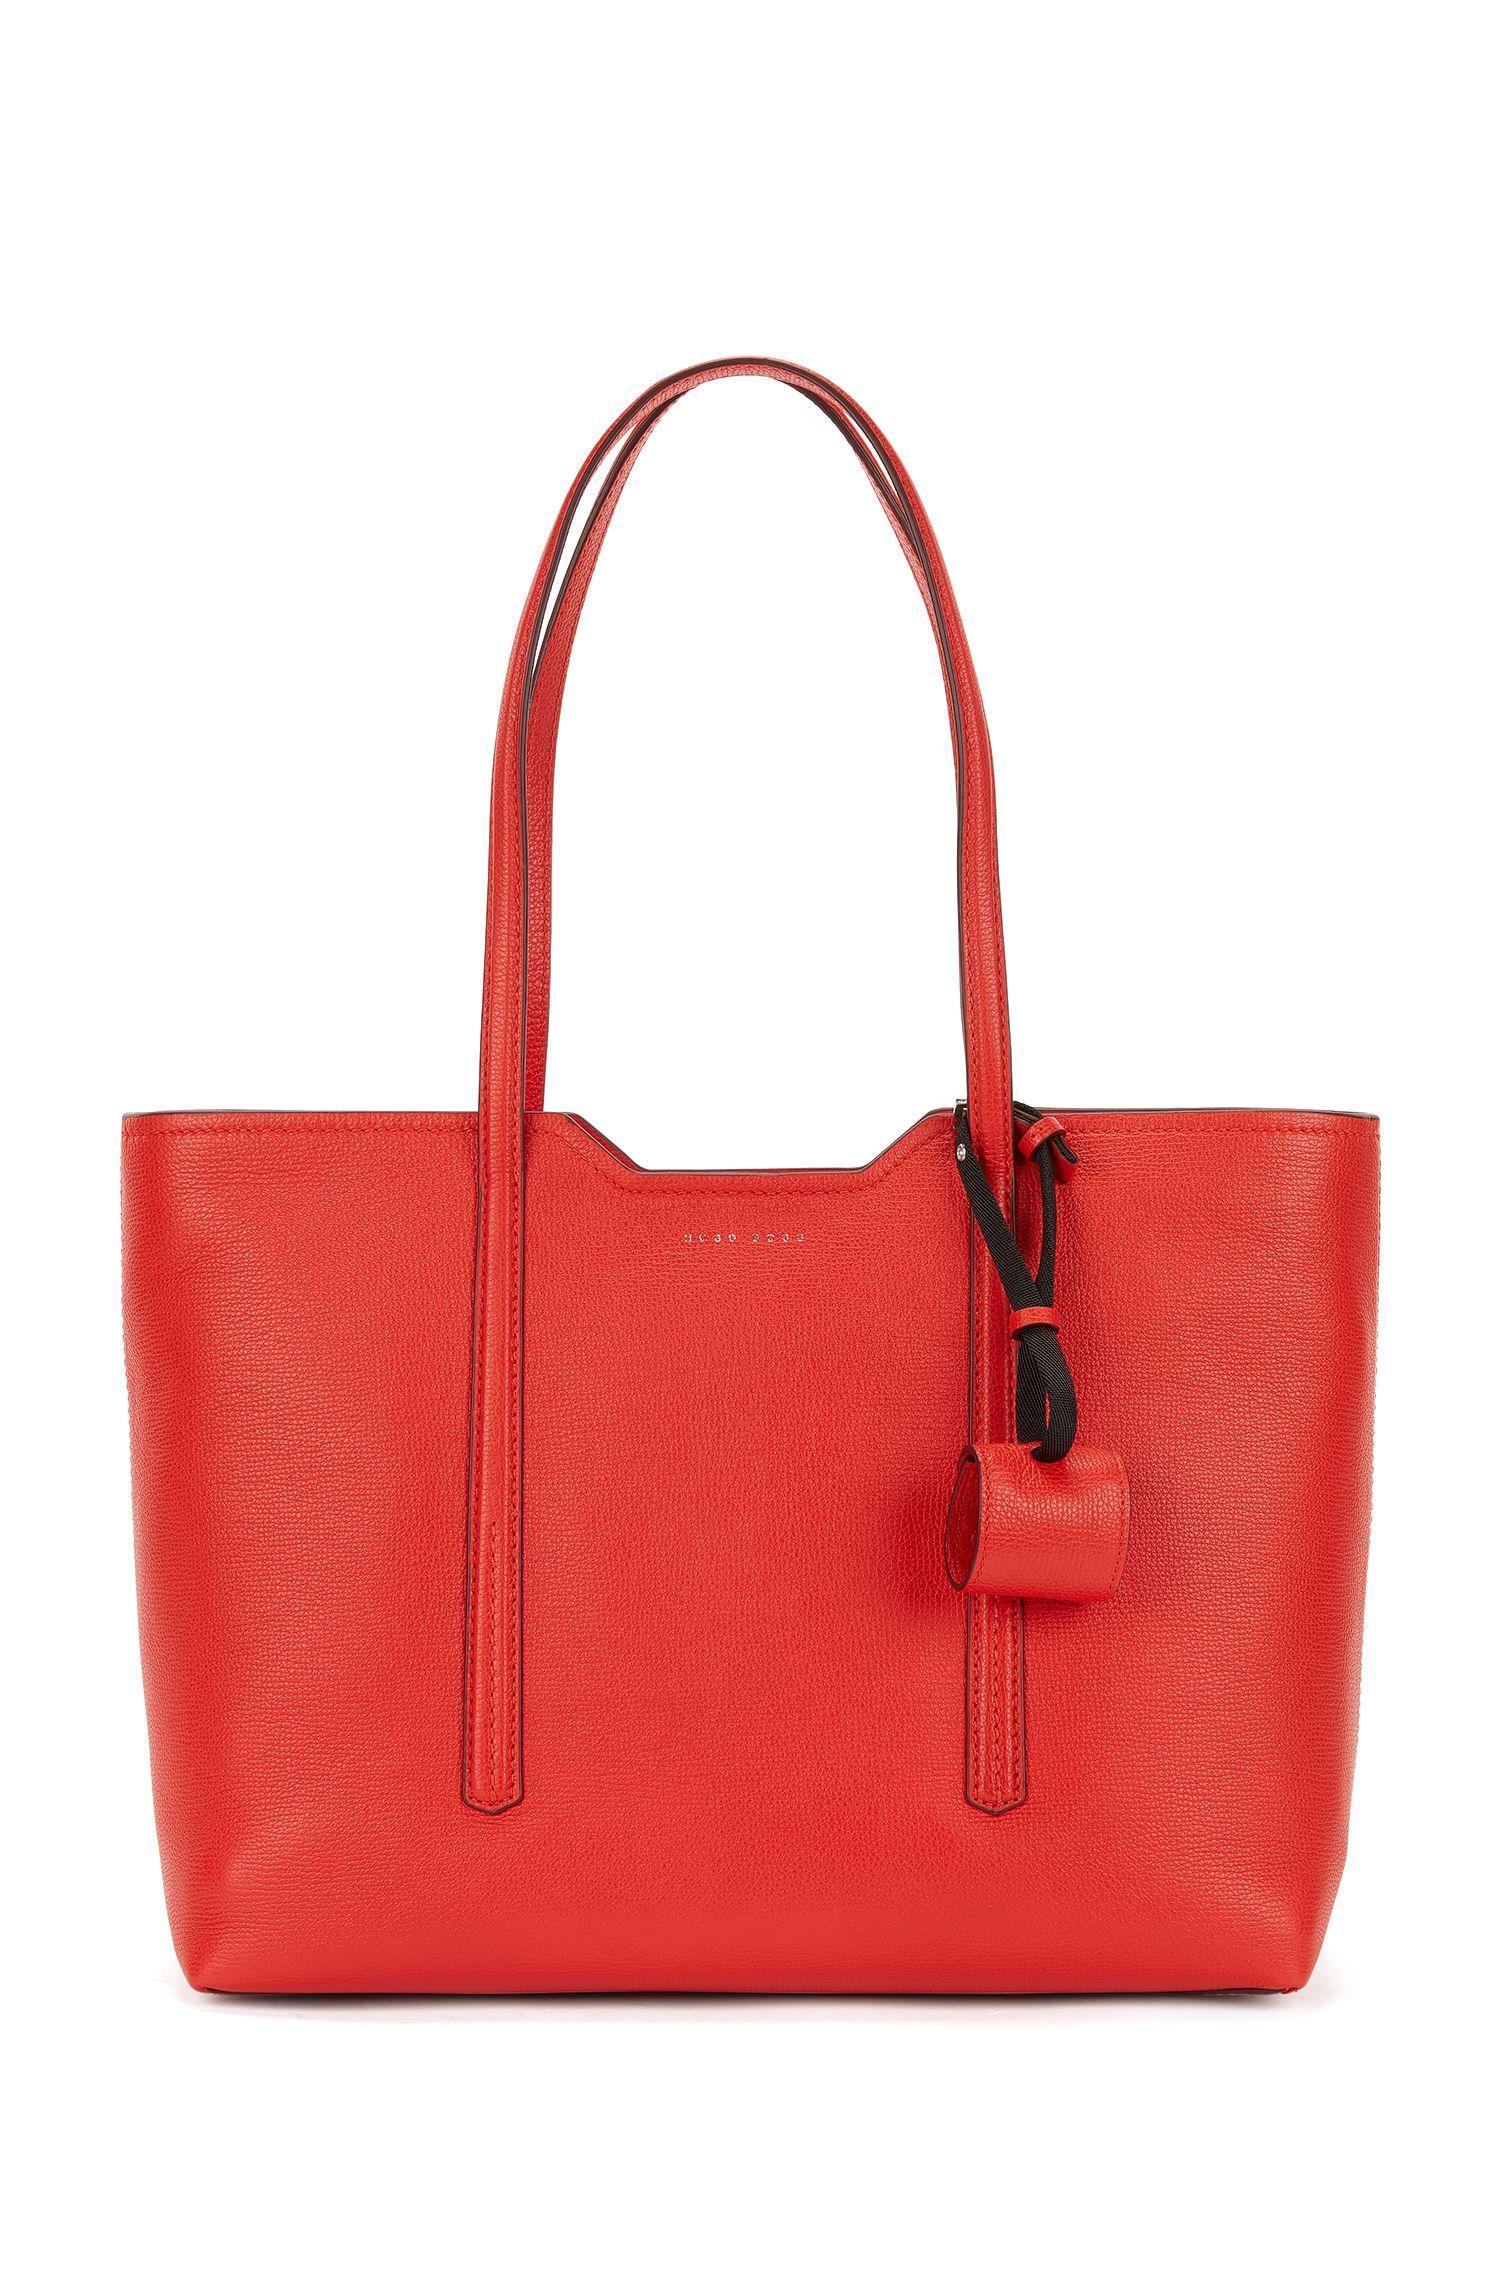 Shopper bag in Italian leather